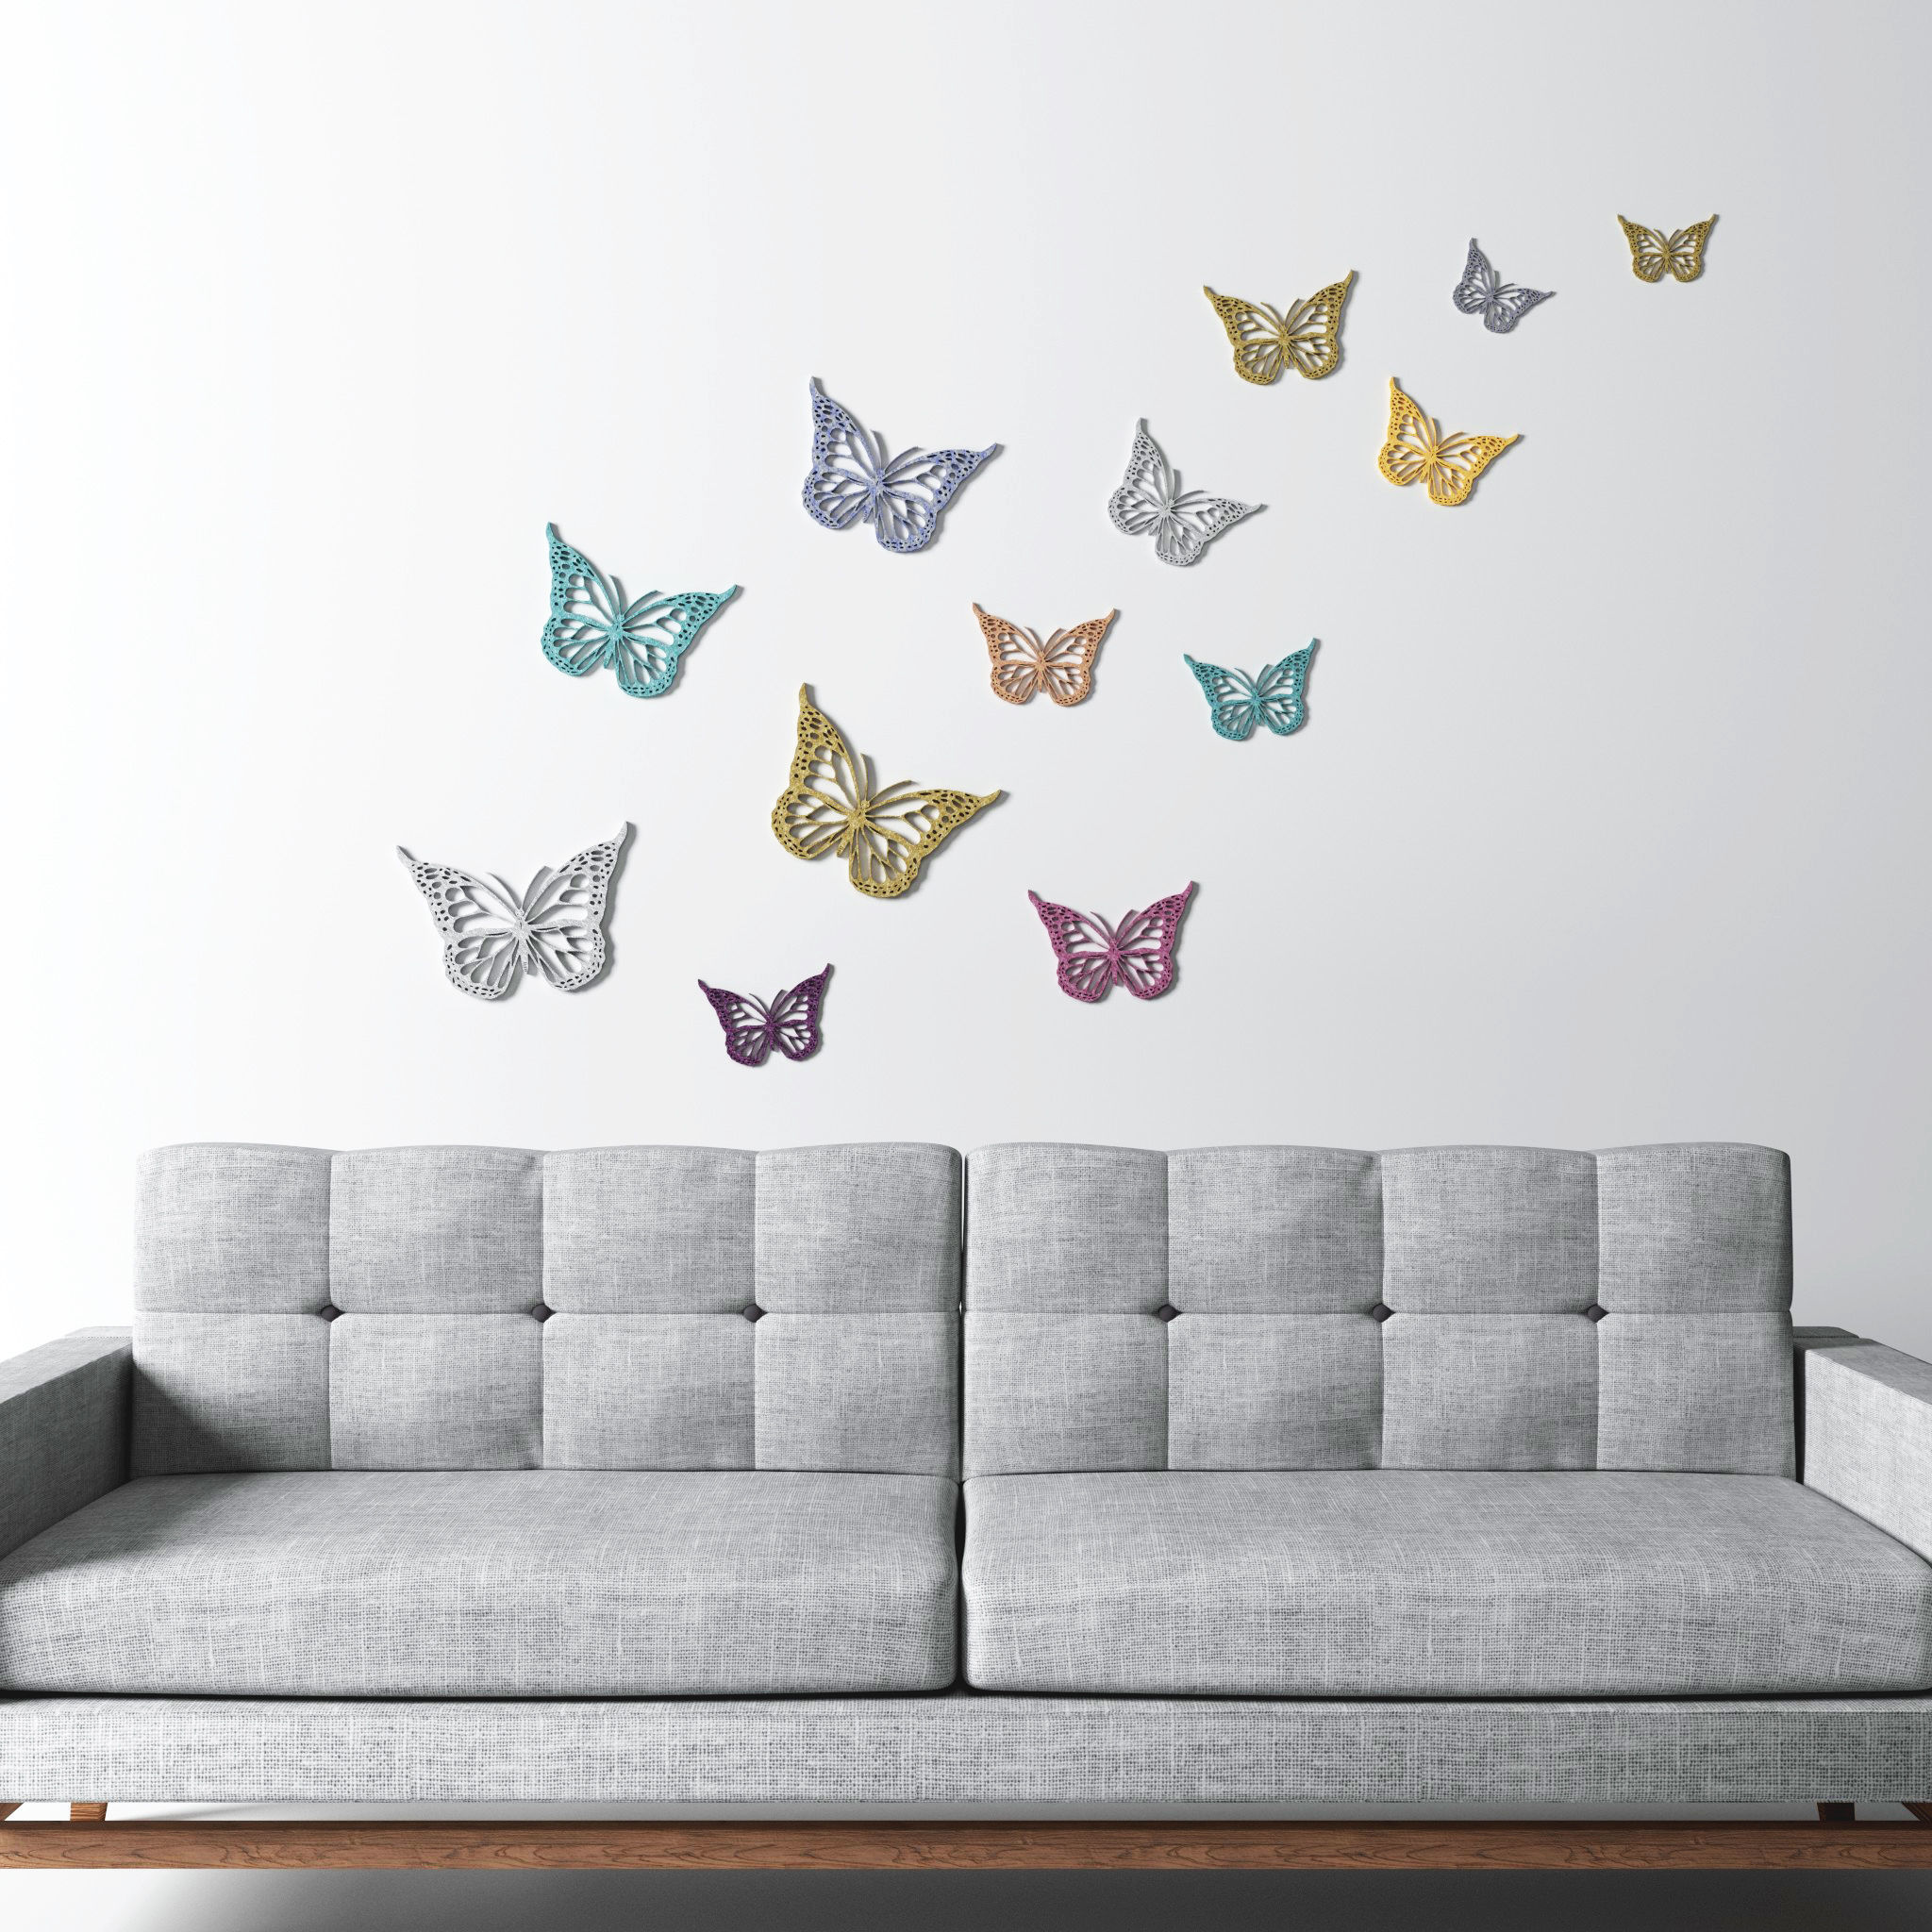 Butterfly Wall decoration Wall art 3D